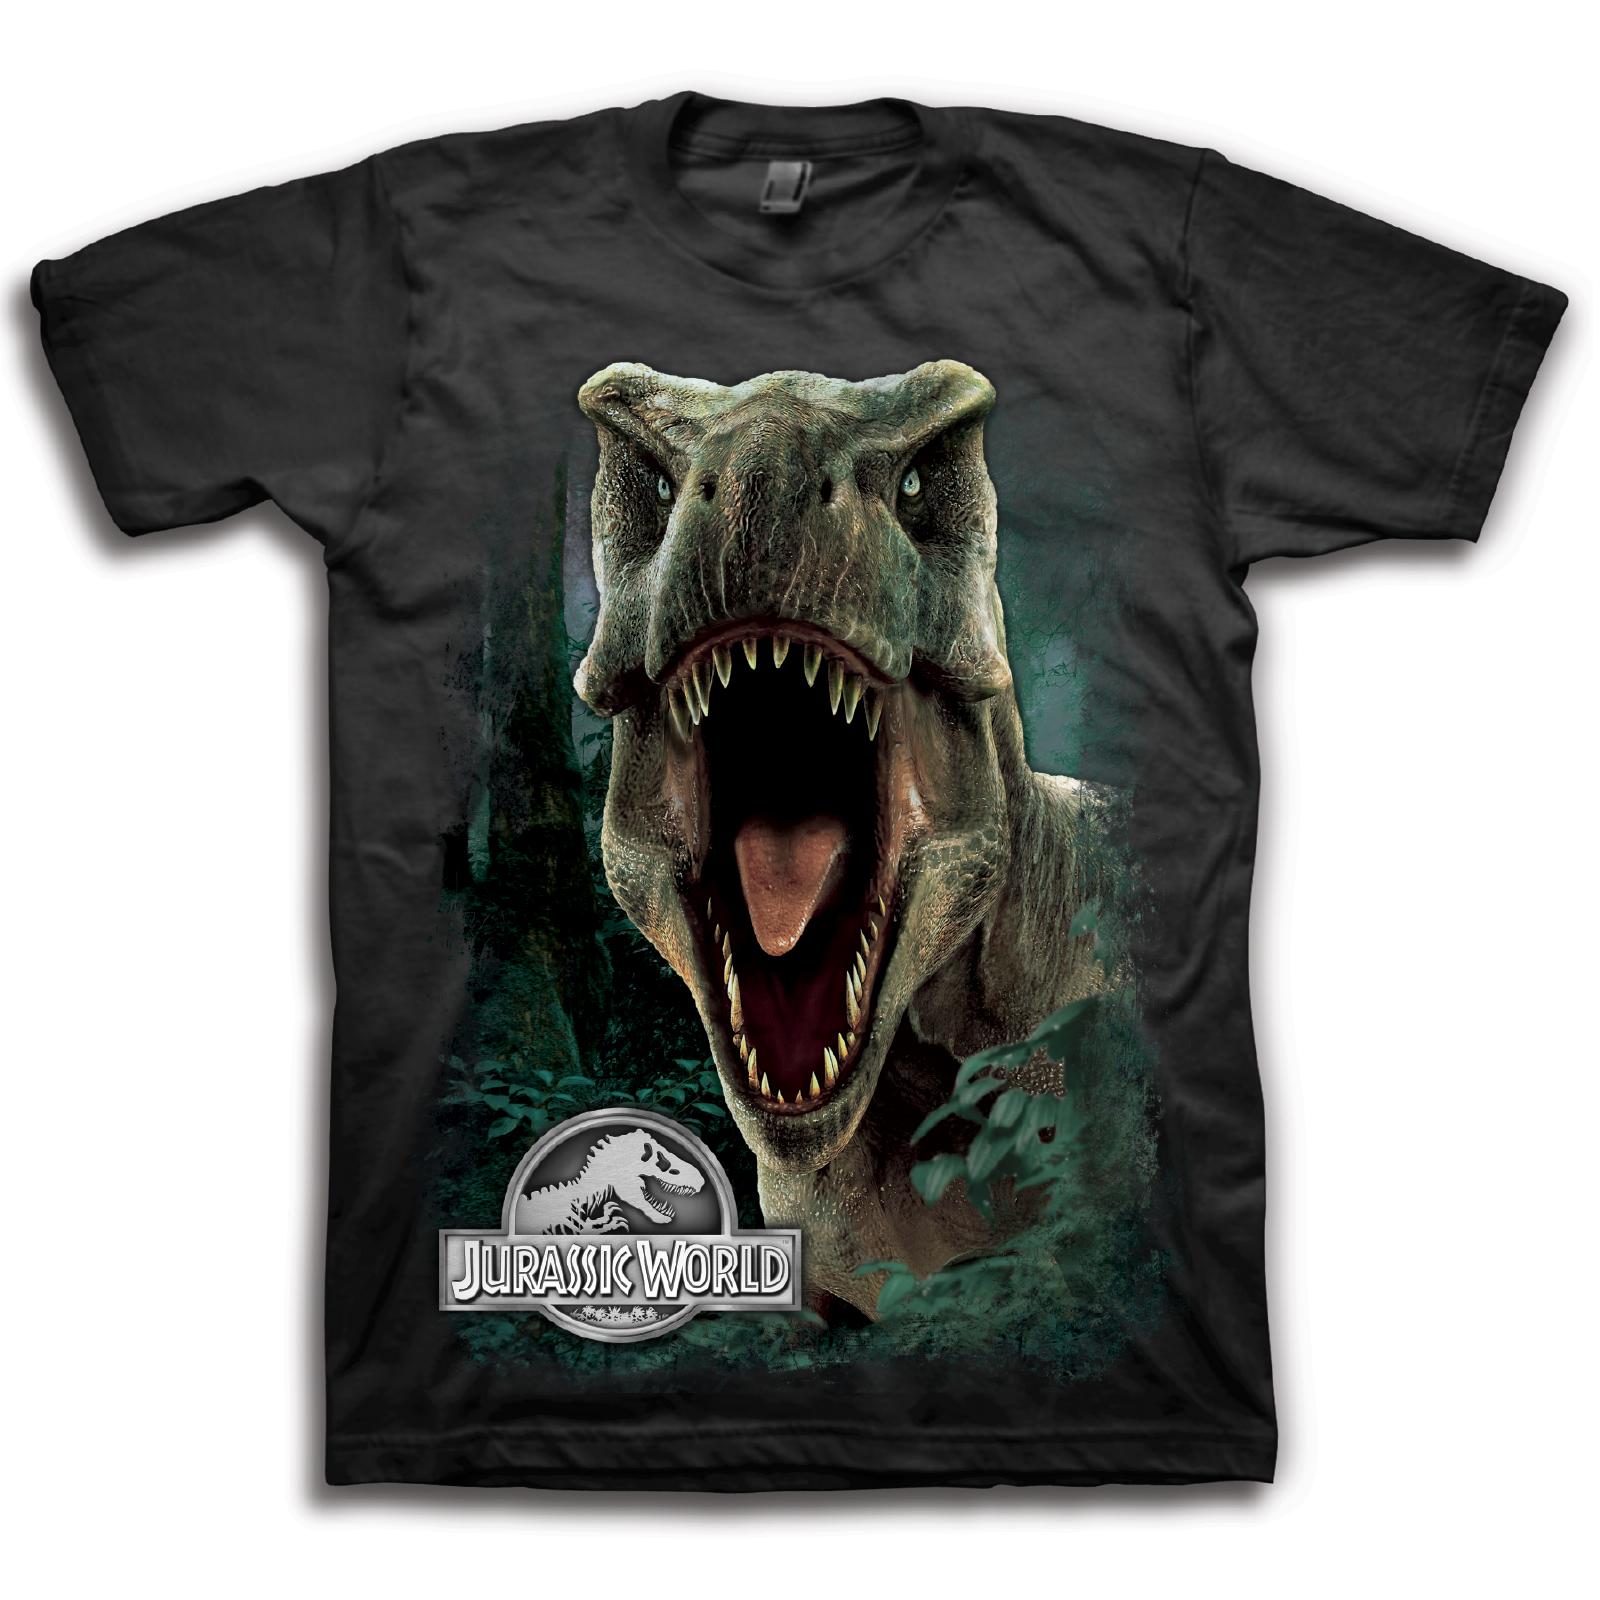 NBC Universal Jurassic World T-Rex Short Sleeve T-Shirt